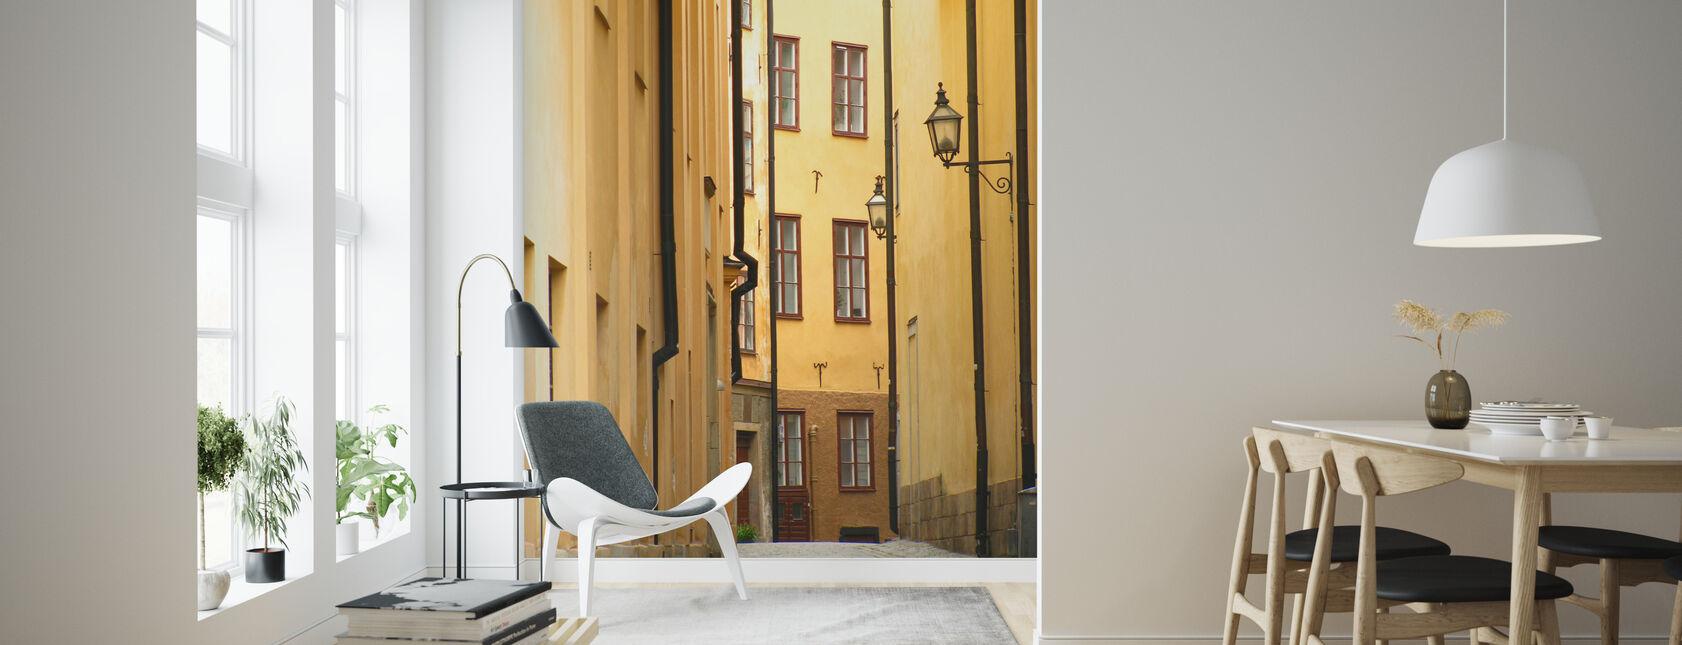 Stockholms smala gränd Gamla stan - Tapet - Vardagsrum